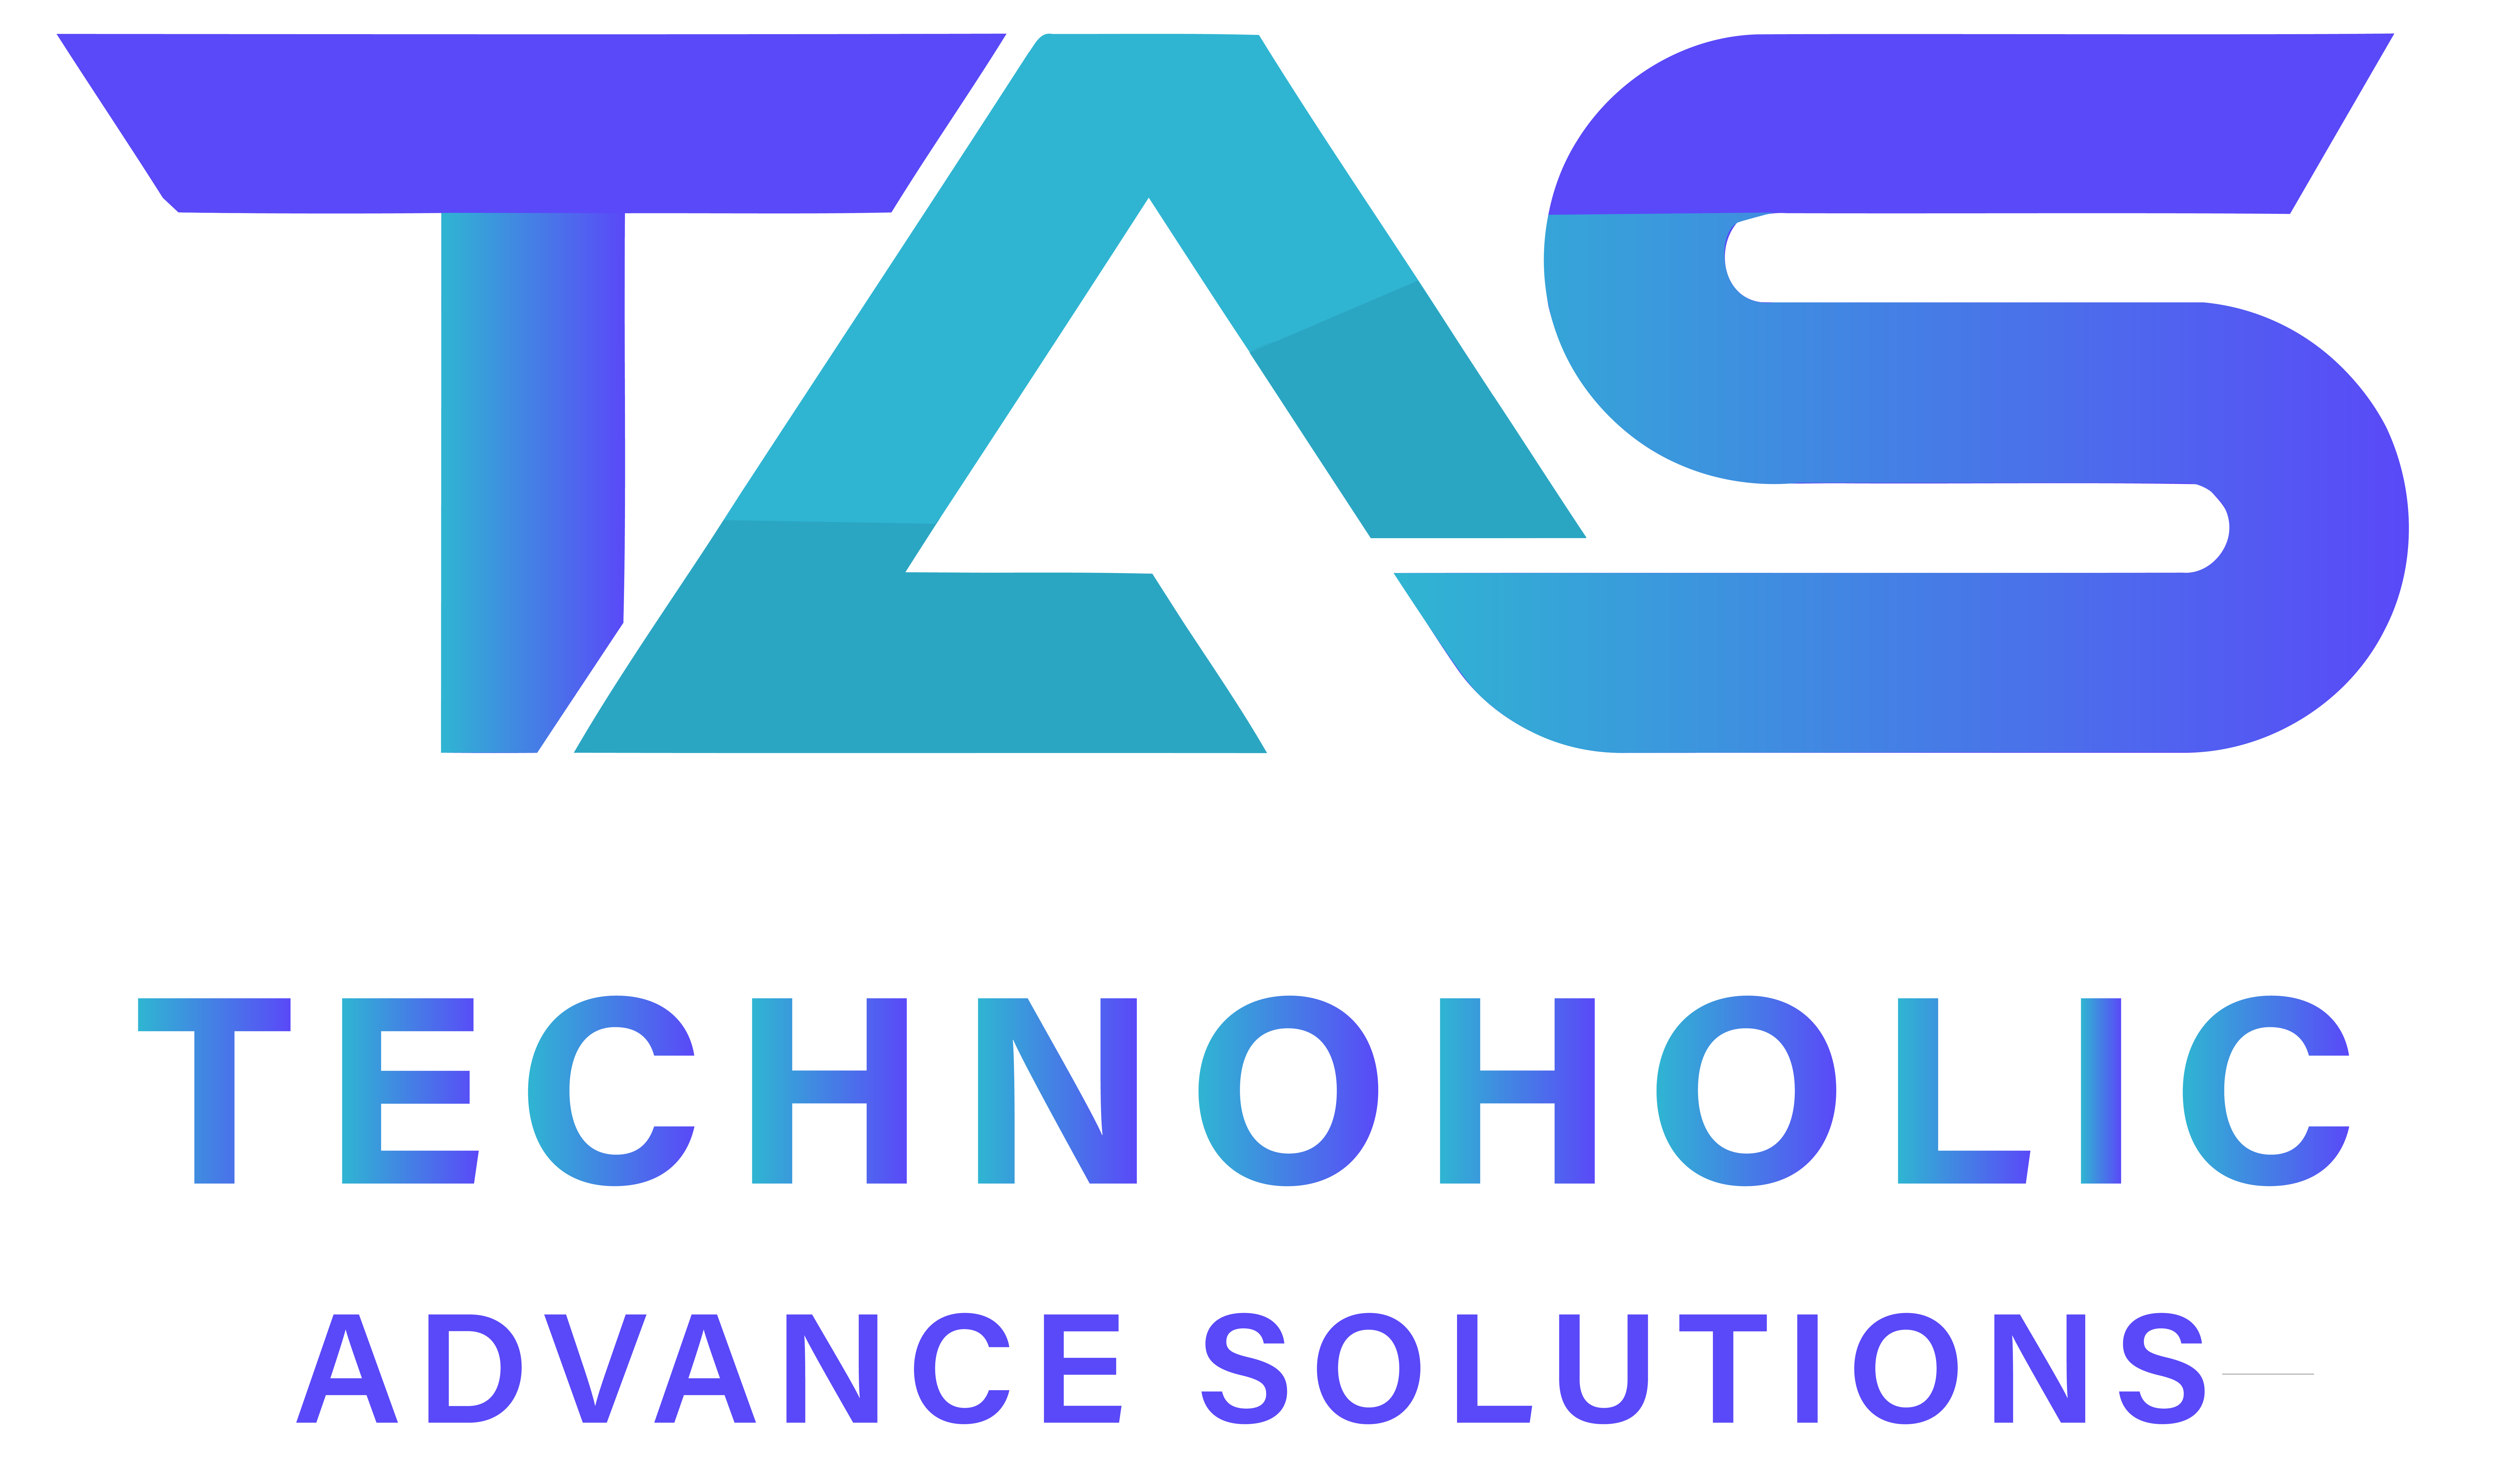 https://www.pakpositions.com/company/technoholic-advance-solutions